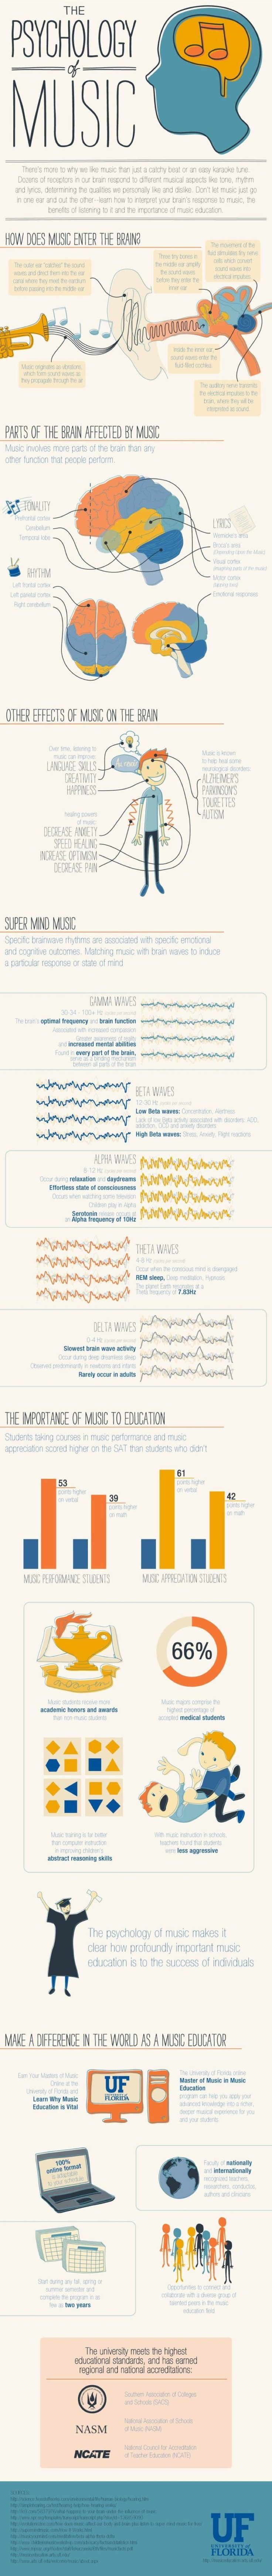 amazing-infographics-music-psychology